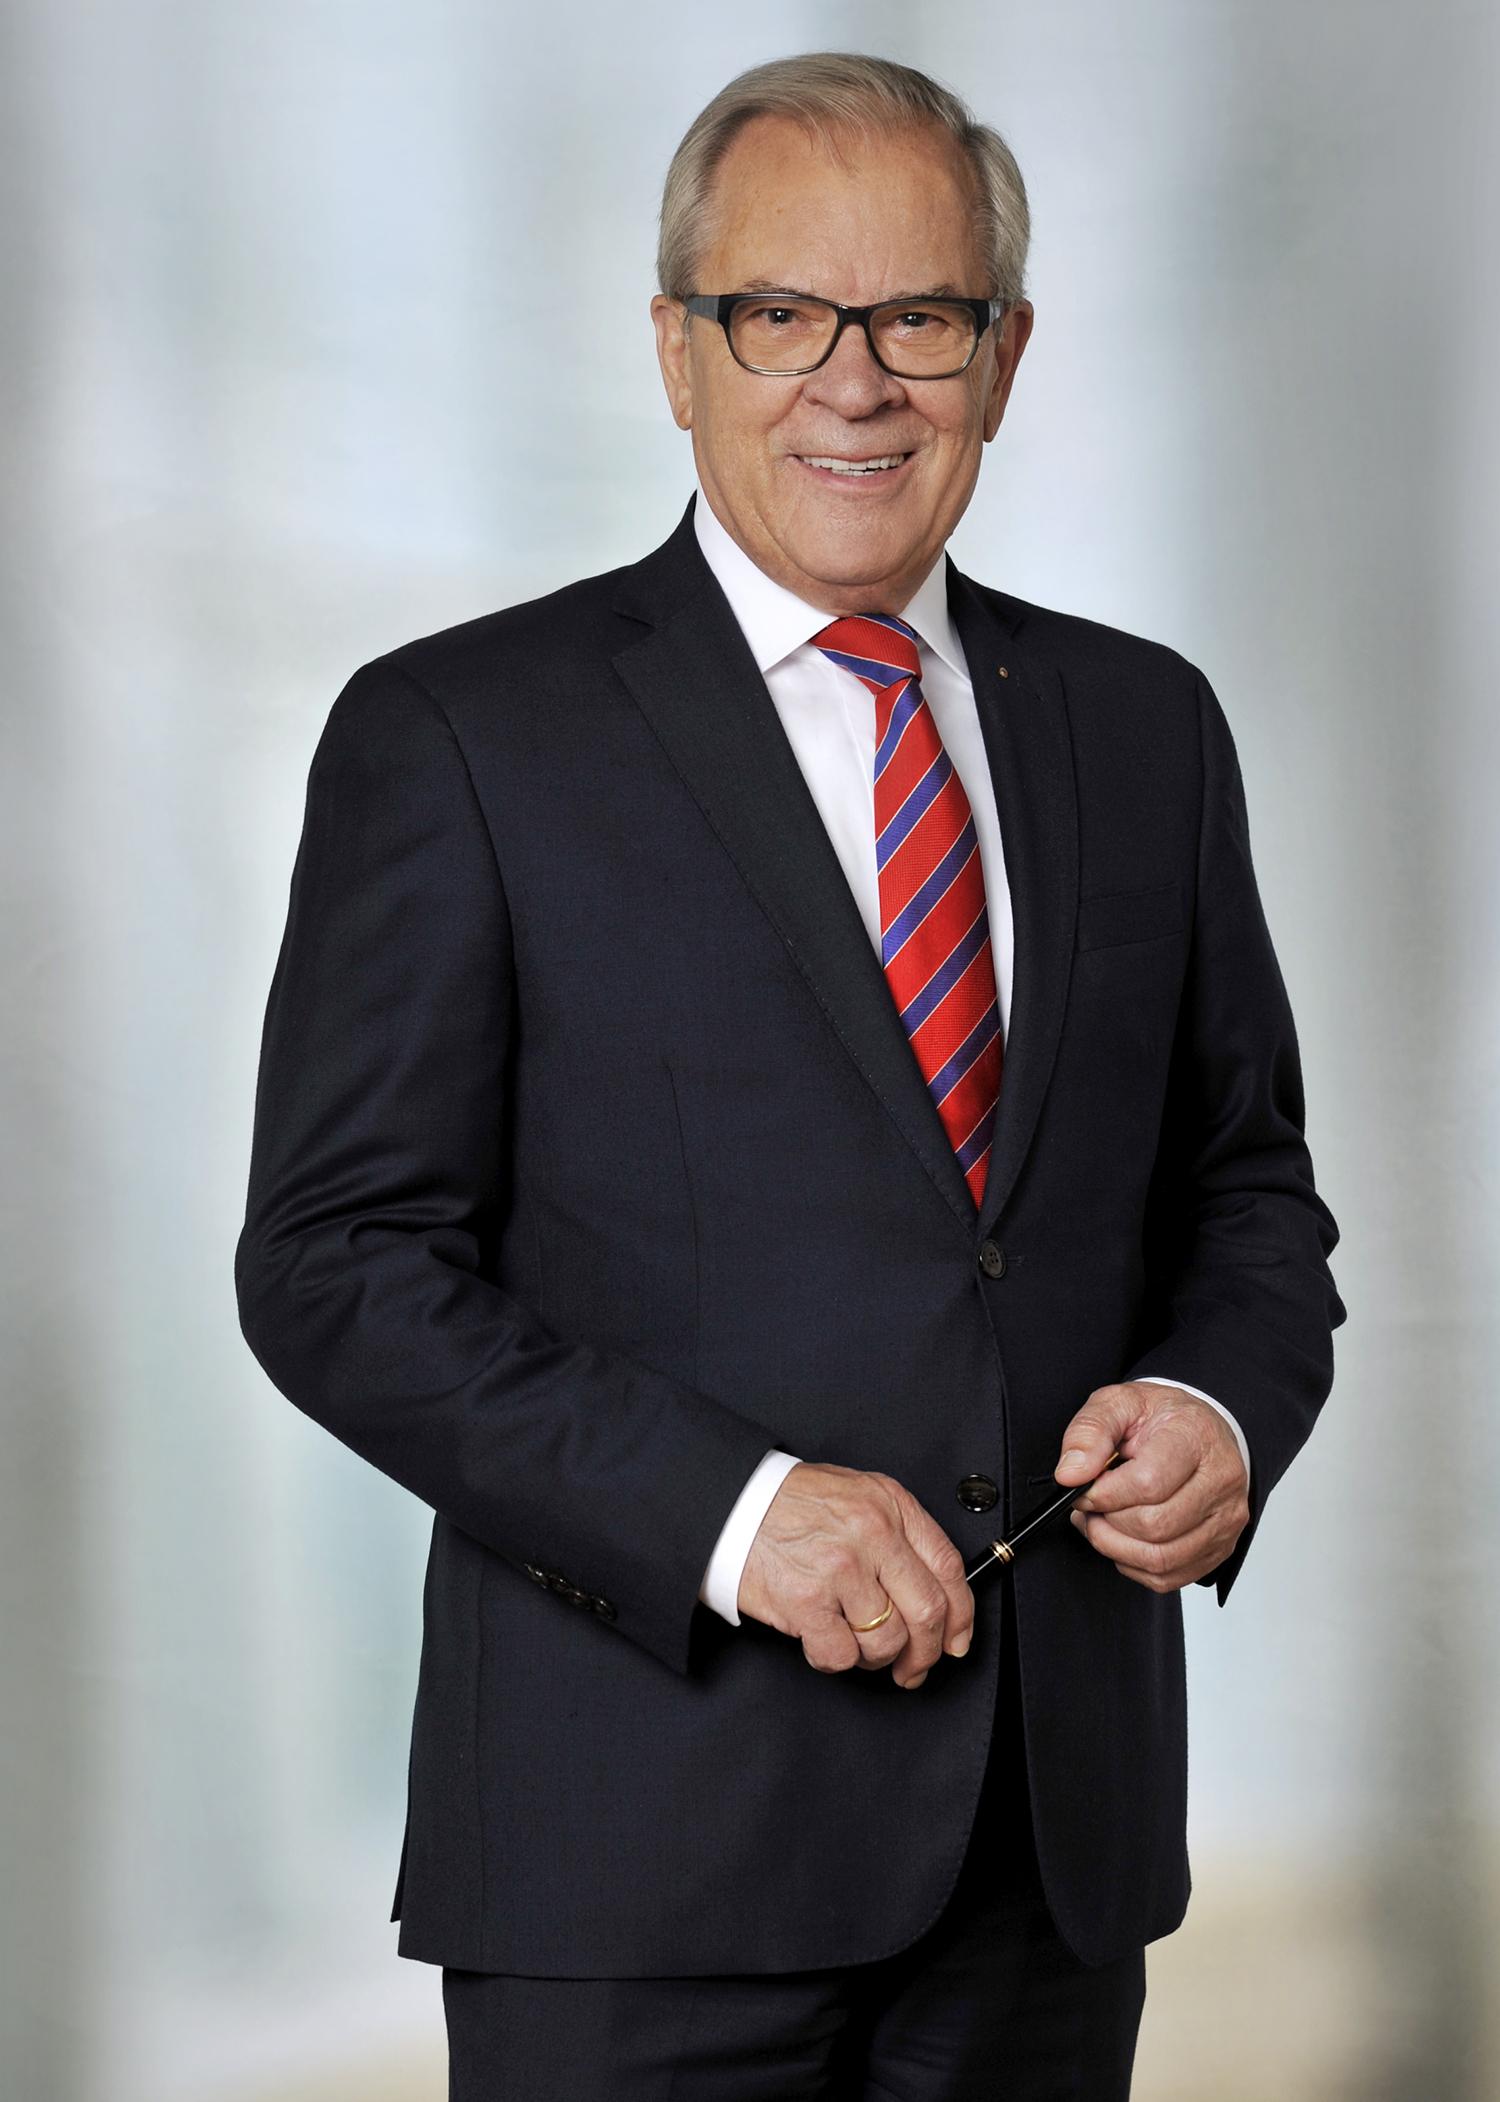 Rüdiger Witthöft